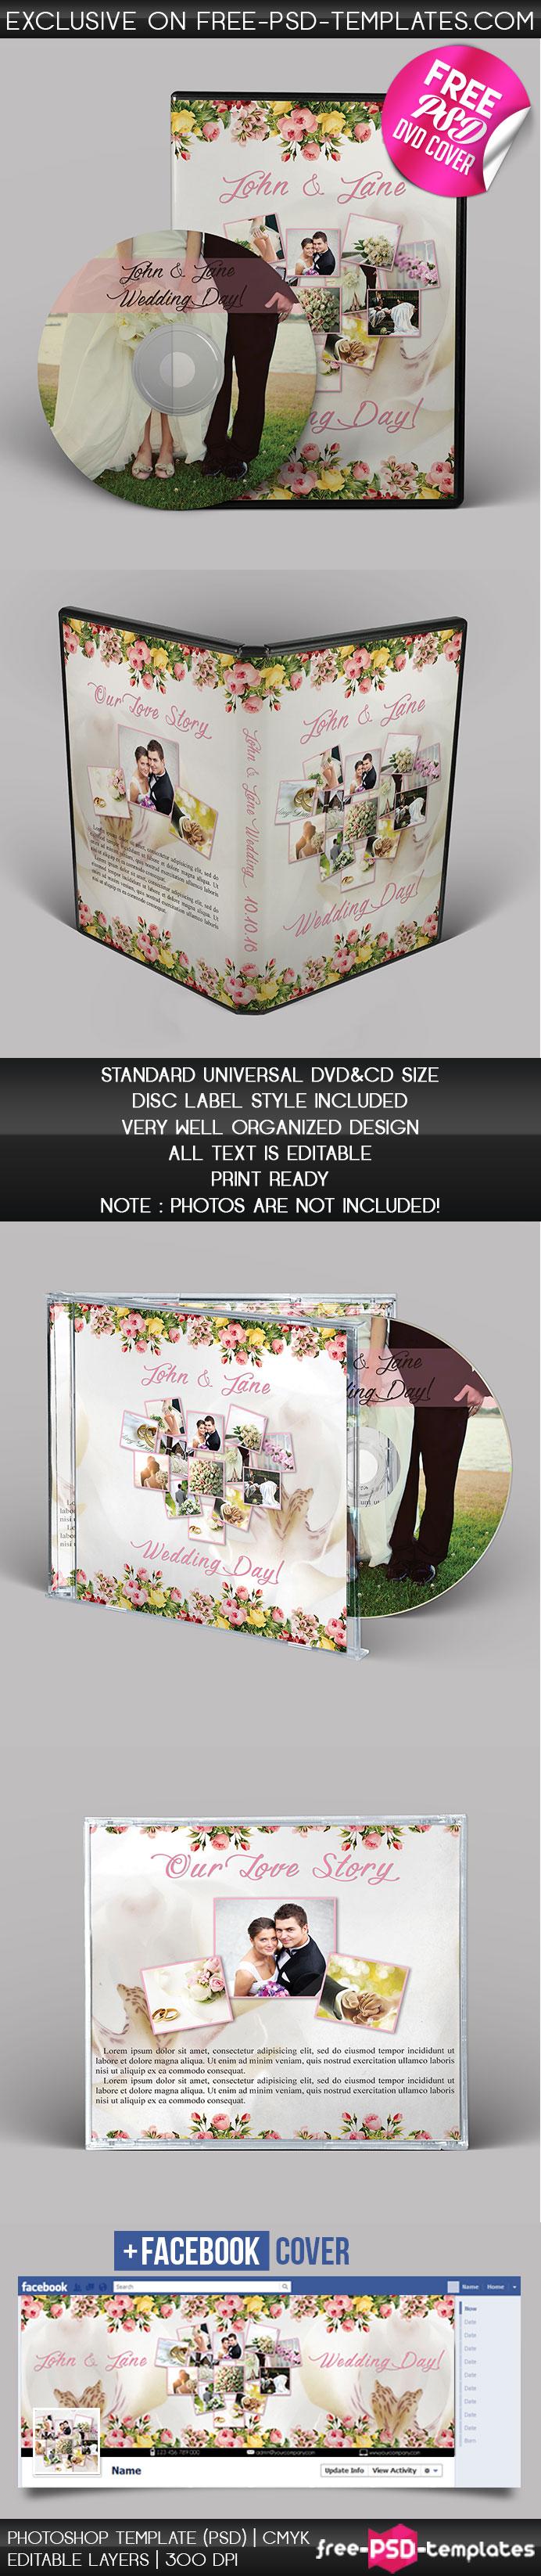 Dvd Label Templates